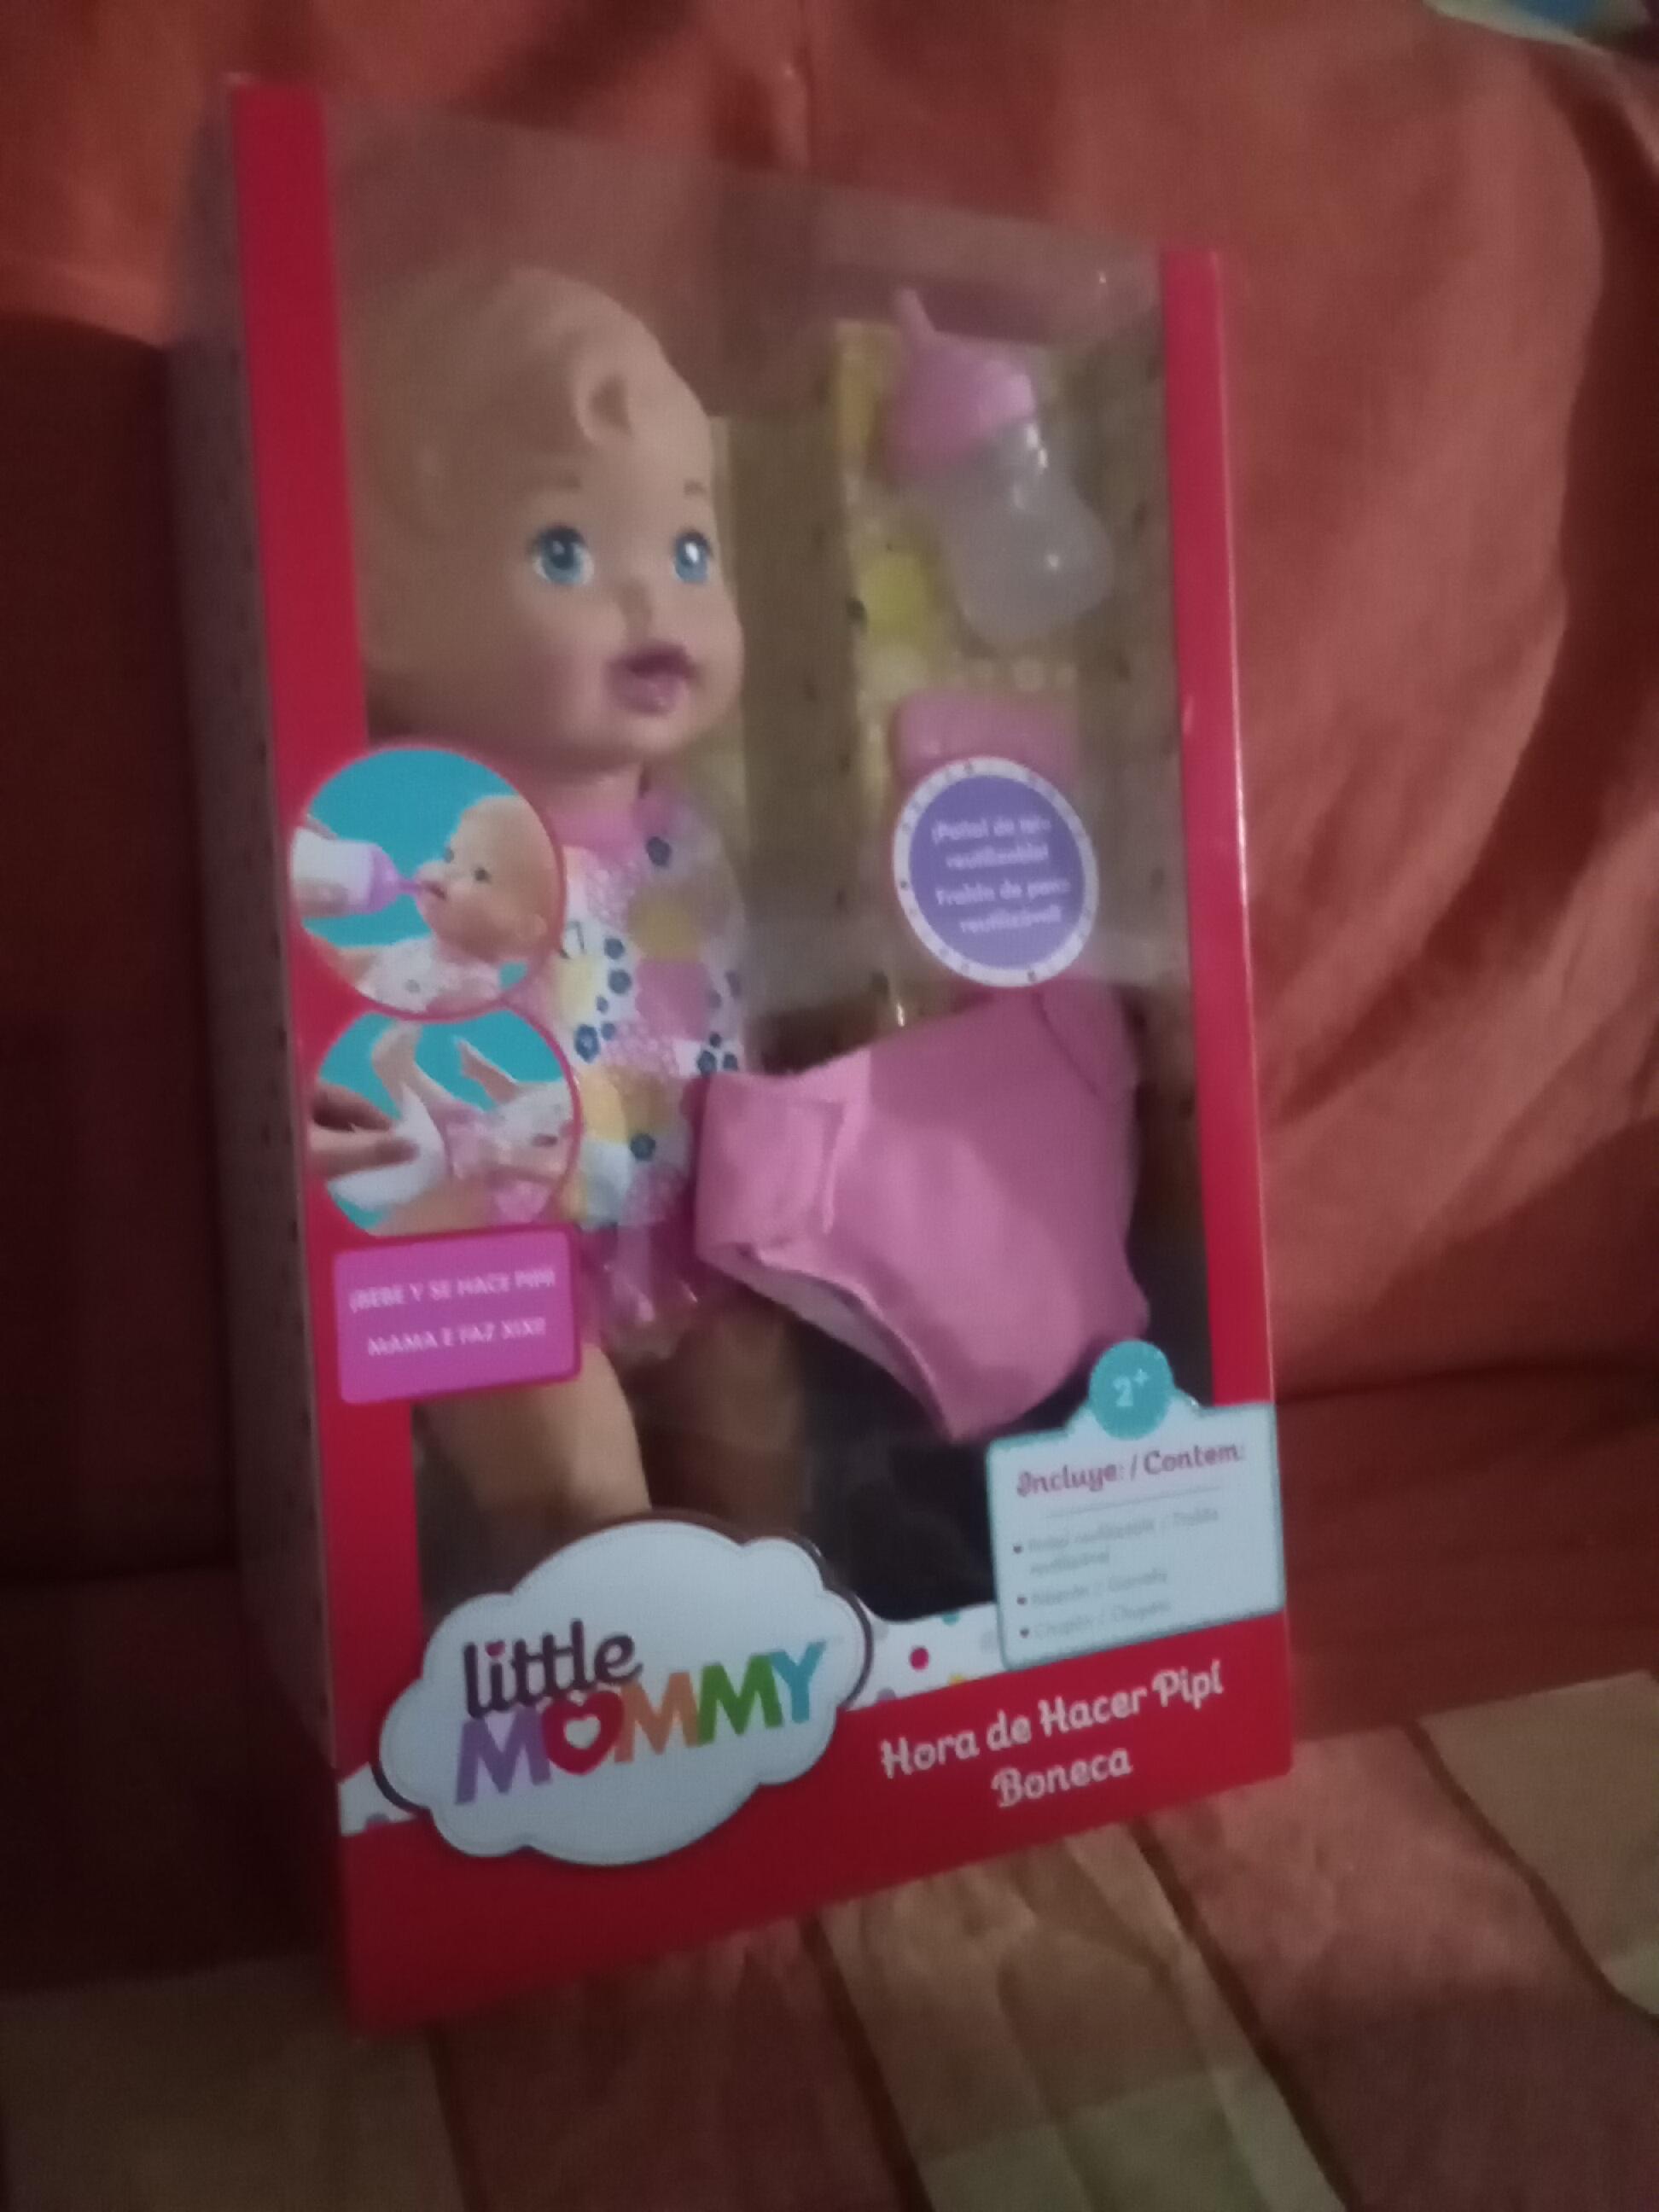 Bodega Aurrerá Palomas: Little Mommy: Hora de hacer pipí